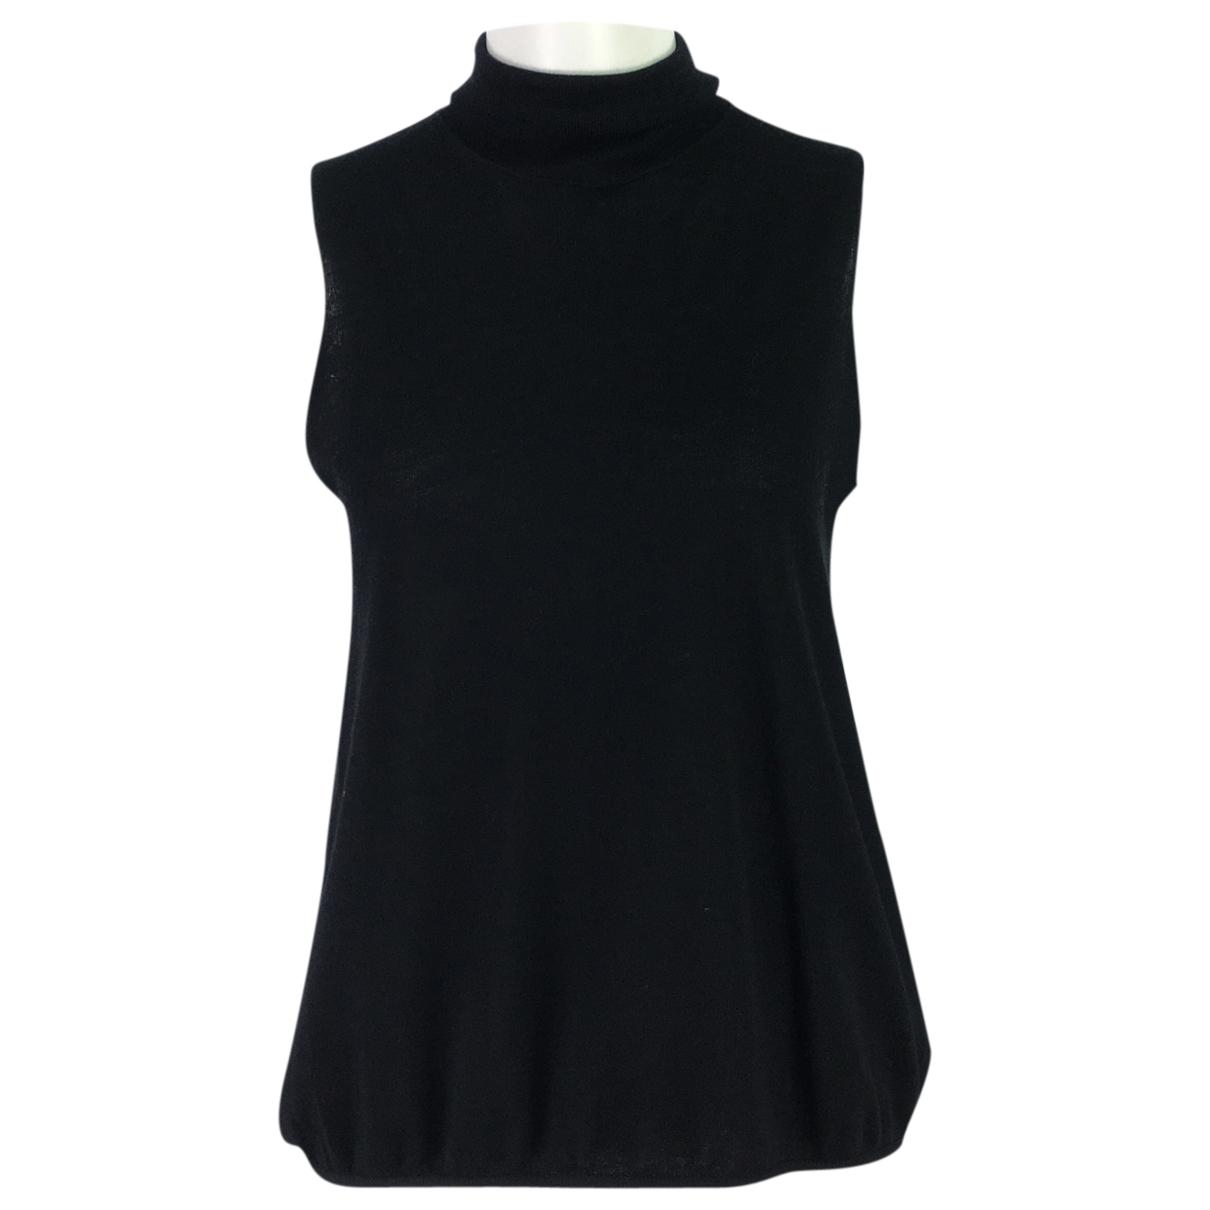 Max Mara \N Black Wool  top for Women XL International